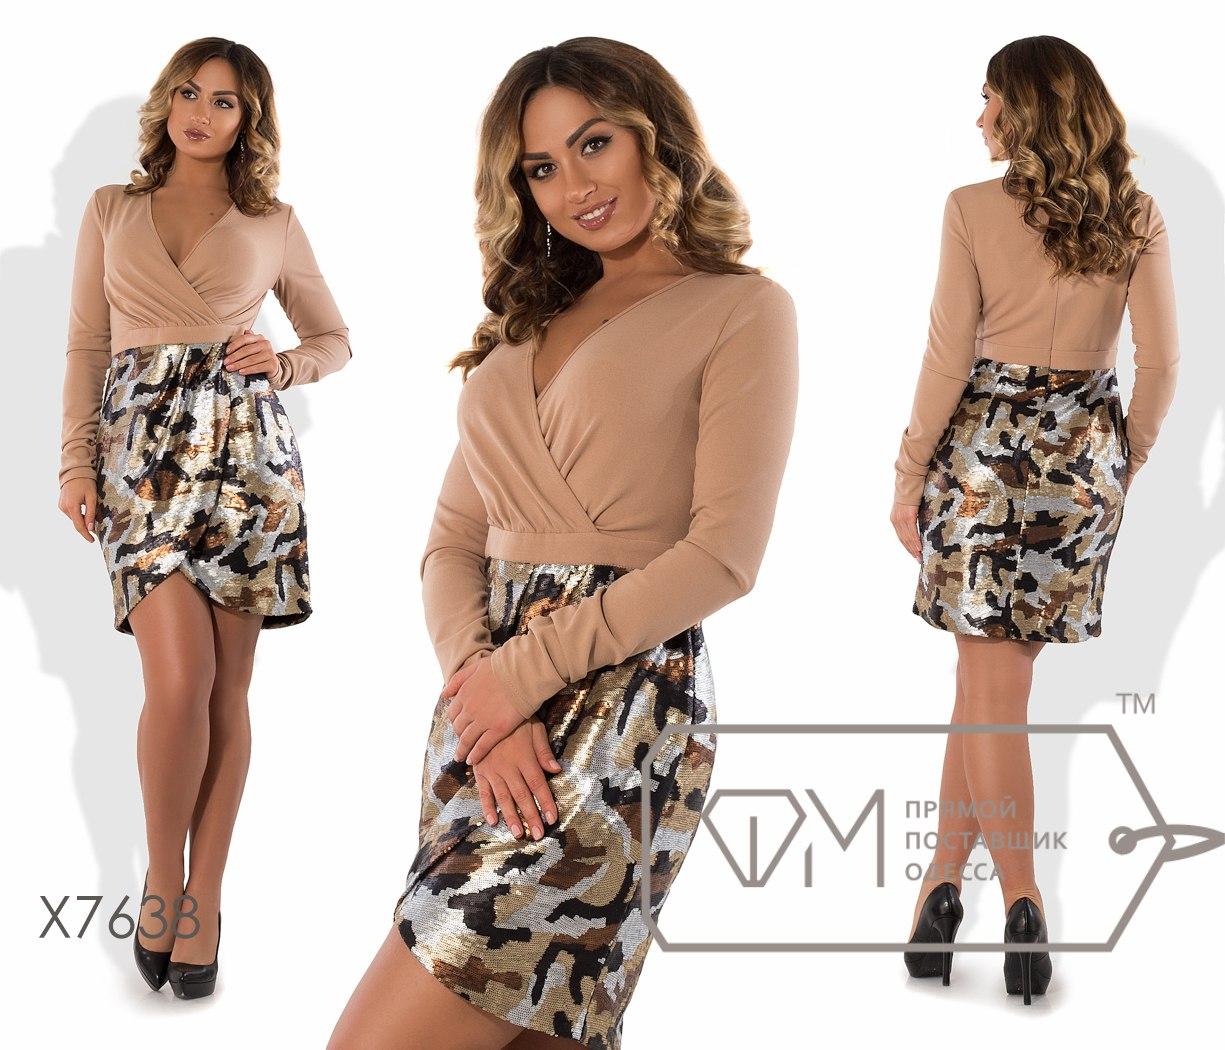 x7638 - платье